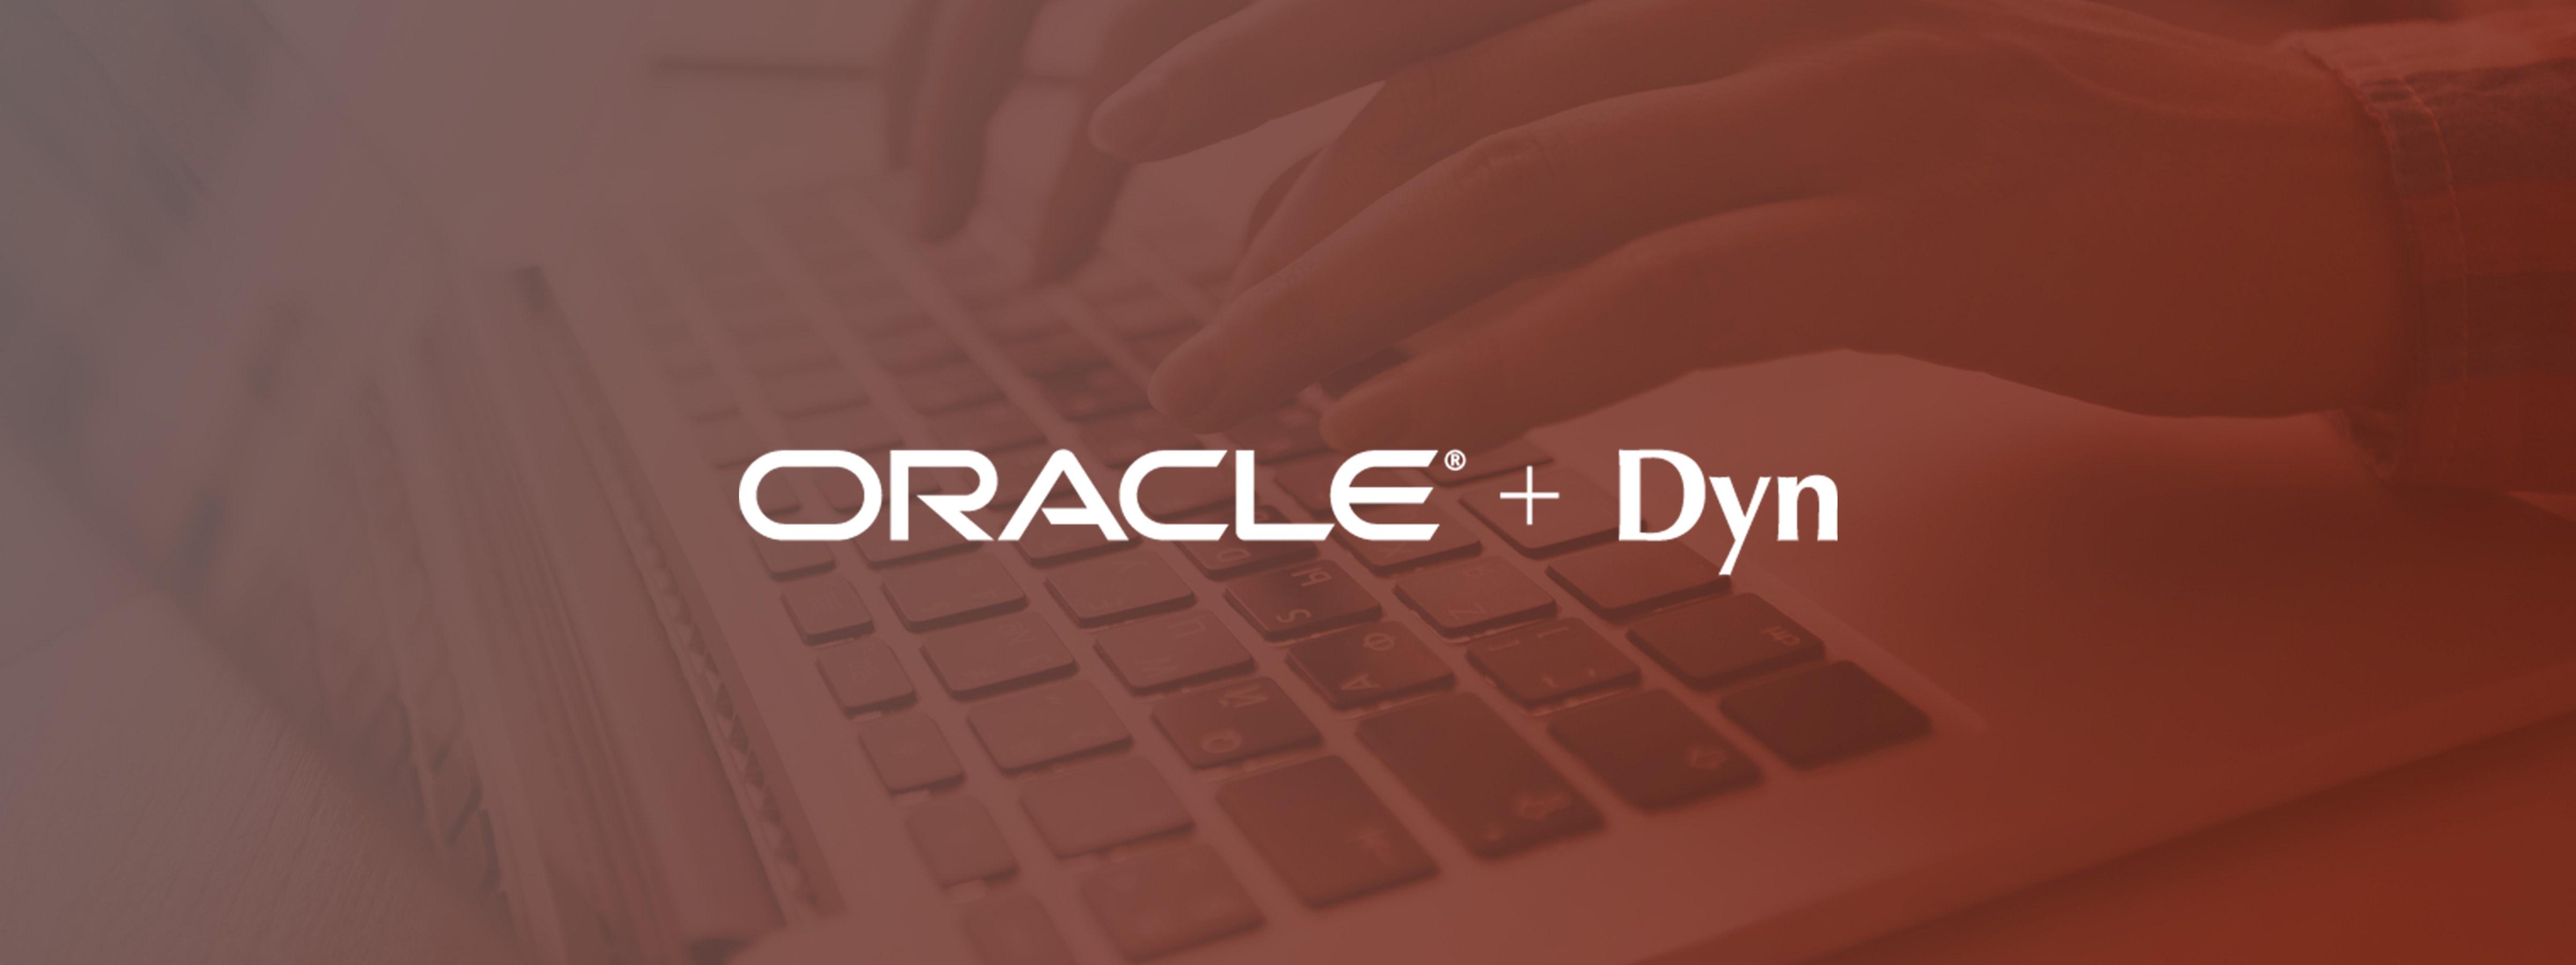 Orcacle + Dyn Logo